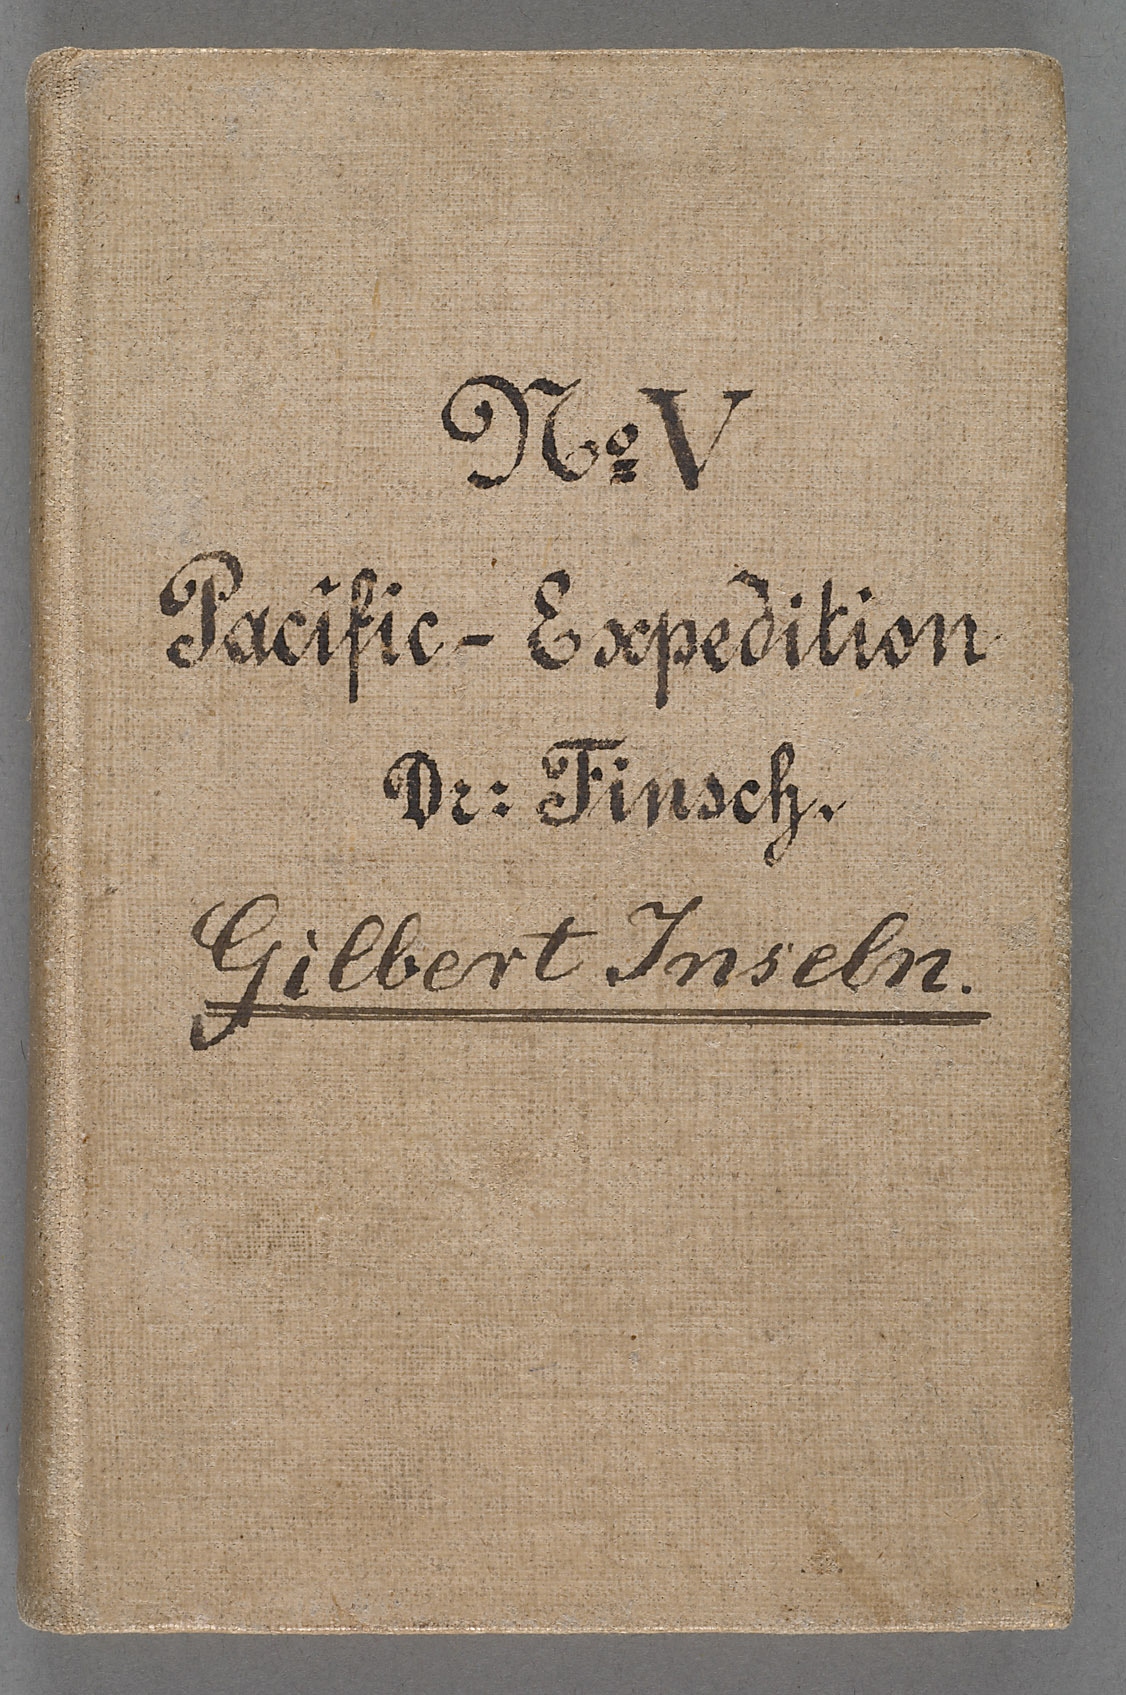 Nachlass Dr. Otto Finsch, Tagebuch V